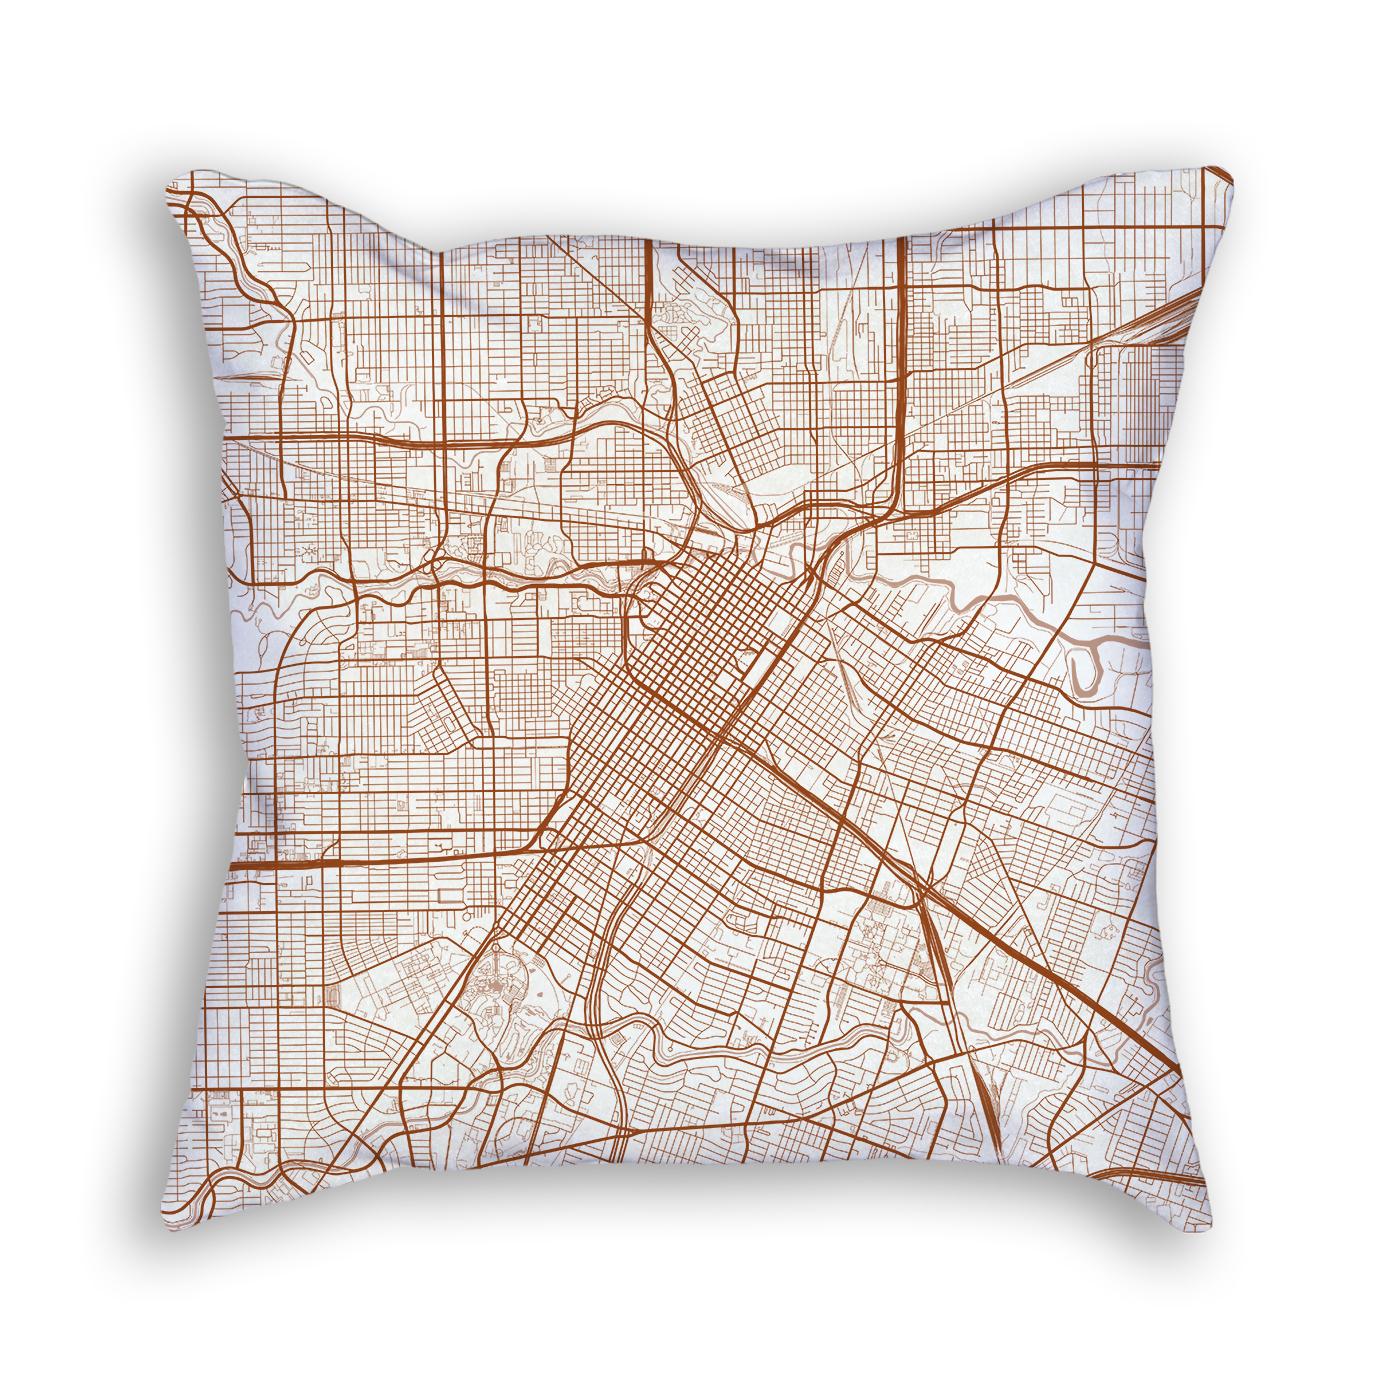 Houston Texas Throw Pillow – City Map Decor - Texas Map Pillow